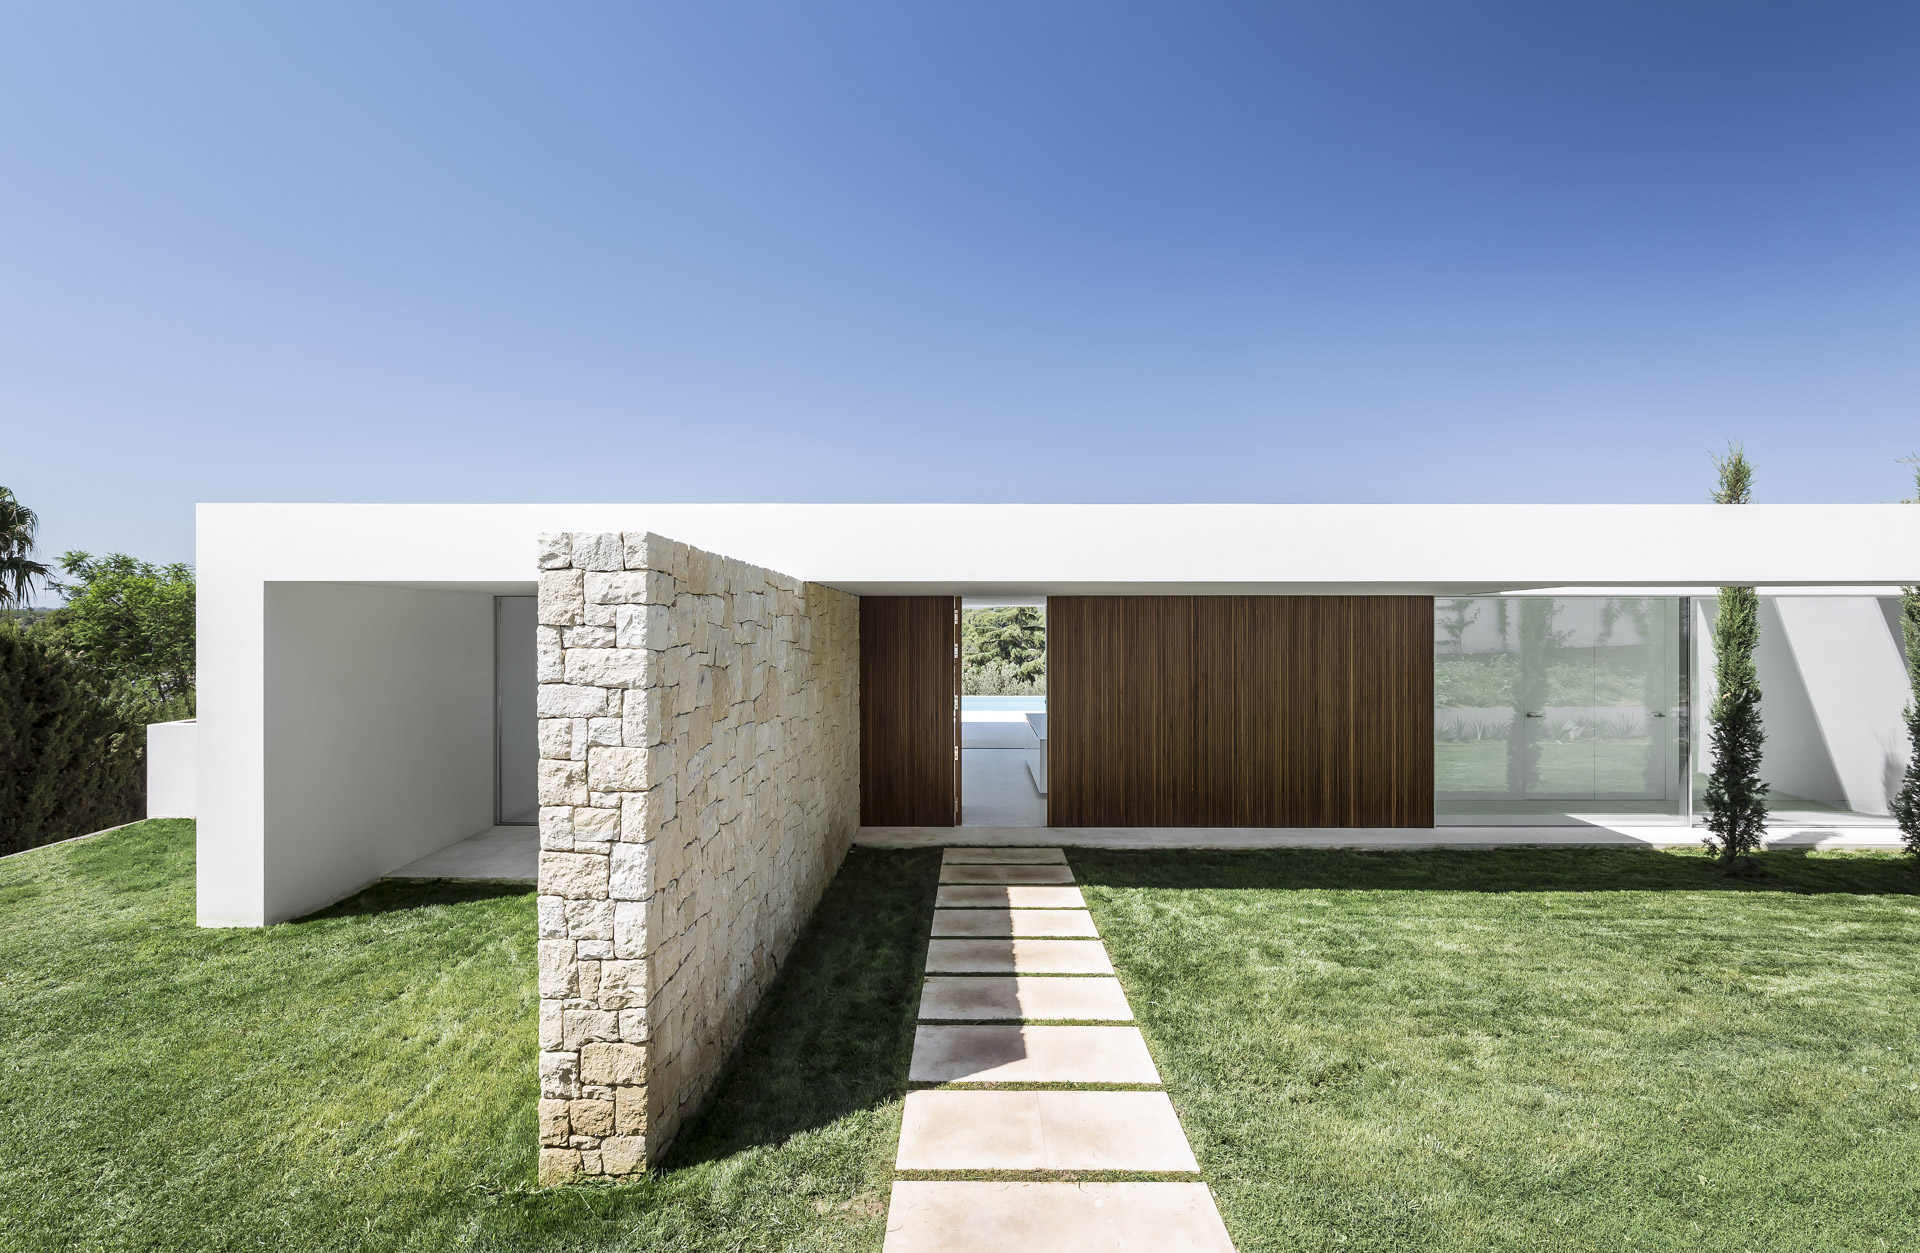 fotografia-arquitectura-valencia-german-cabo-gallardo-llopis-villamarchante-vivienda-02